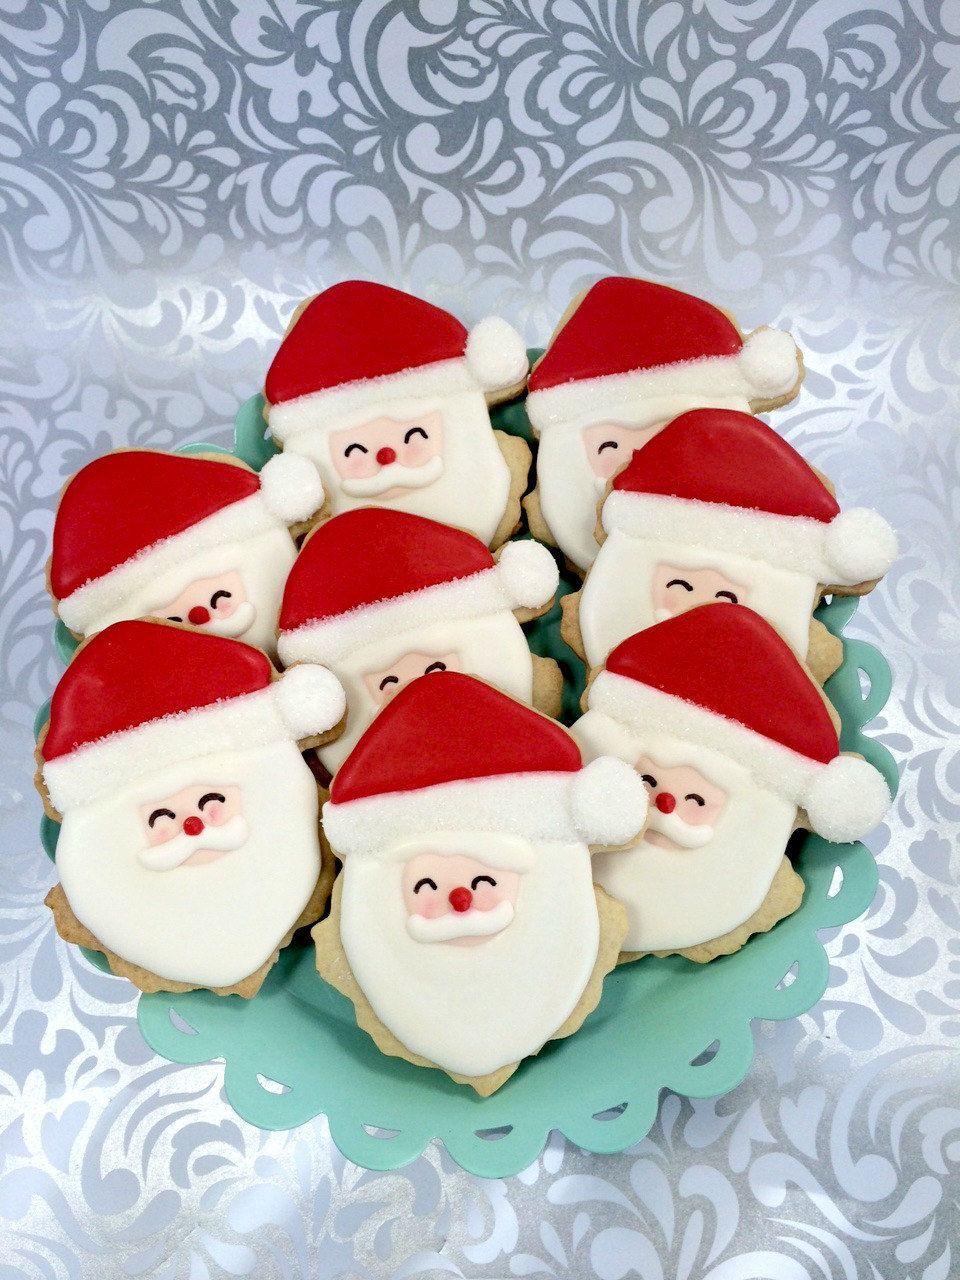 Retro Santa Claus Sugar Cookies by PSSweet on Etsy